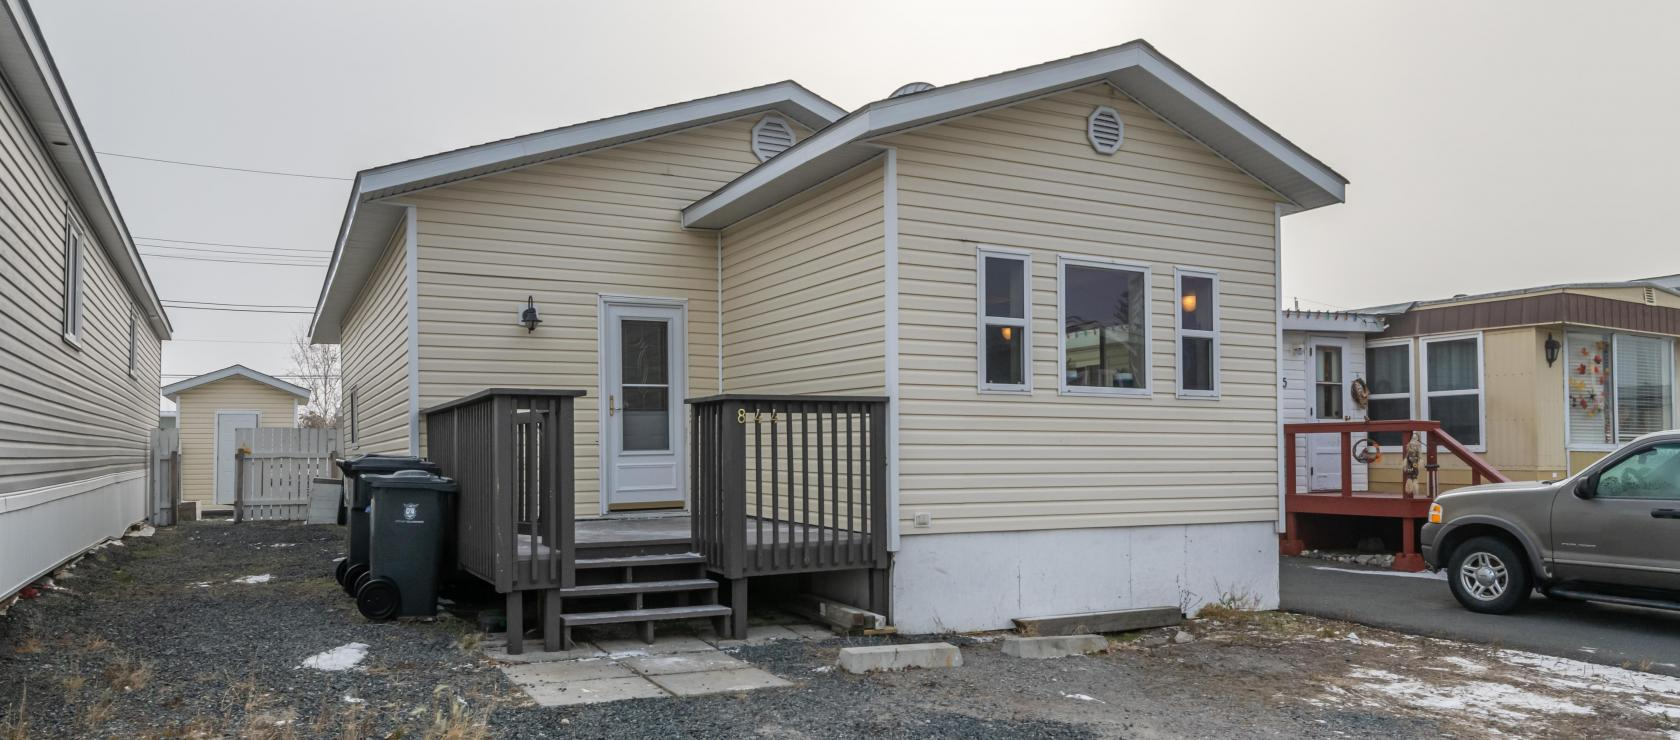 844 Dusseault Court, Kam Lake, Yellowknife 2